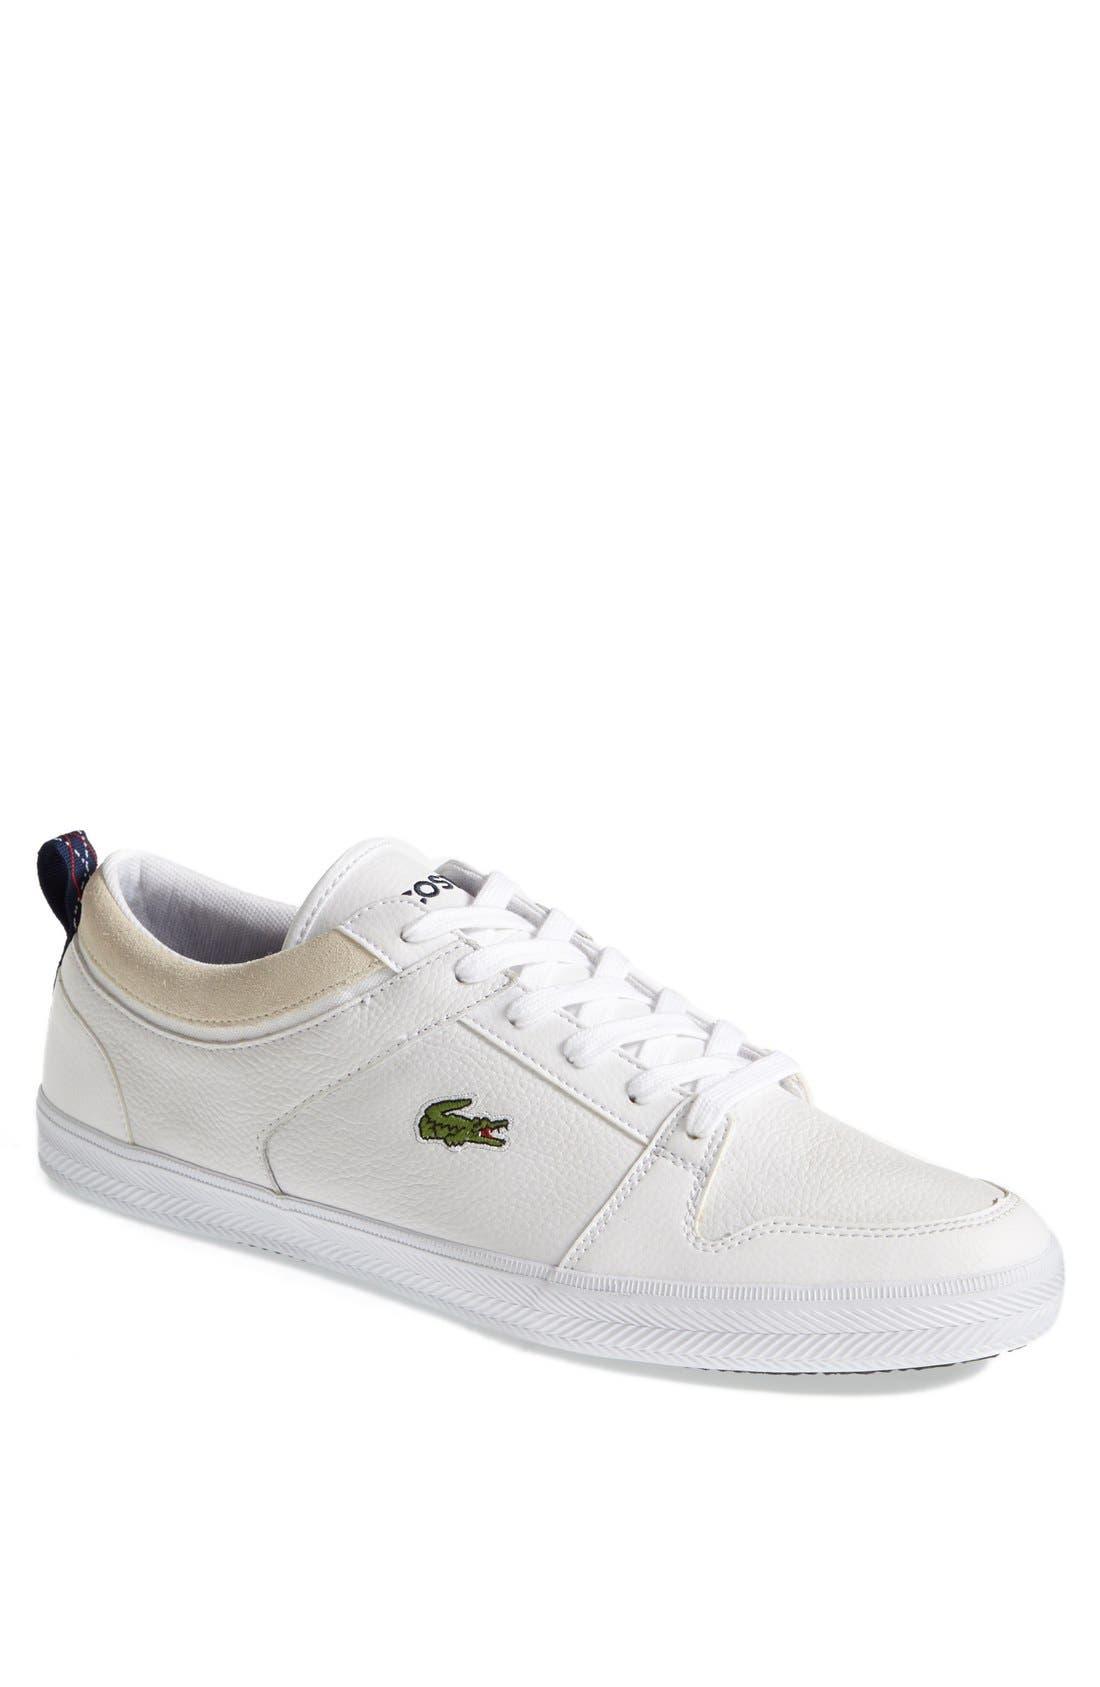 Alternate Image 1 Selected - Lacoste 'Ojetti Mag' Sneaker (Men)